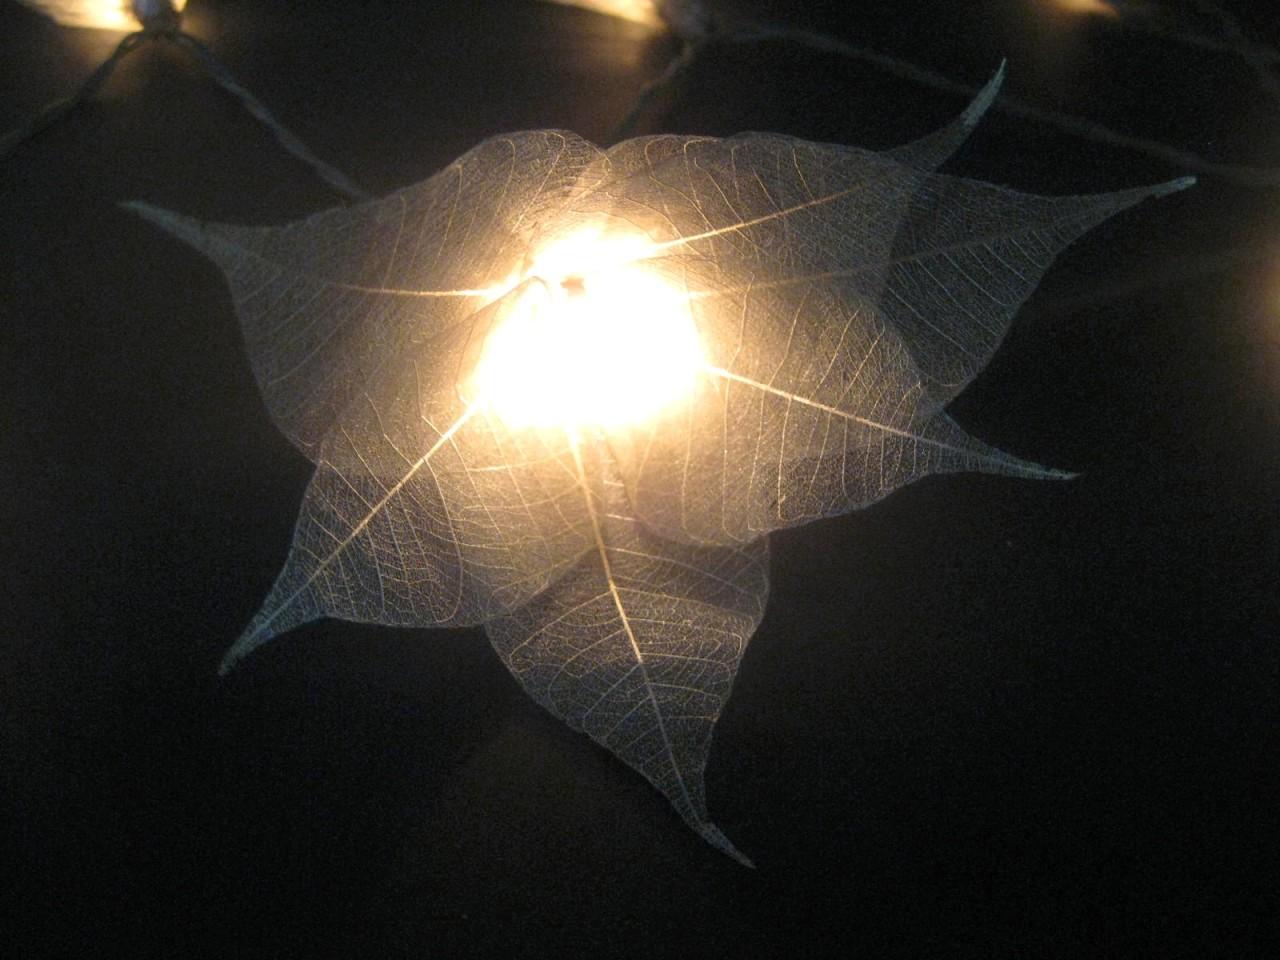 35 SILVER Star Flower 5M LONG LENGTH String LED Fairy Lights Wedding Party